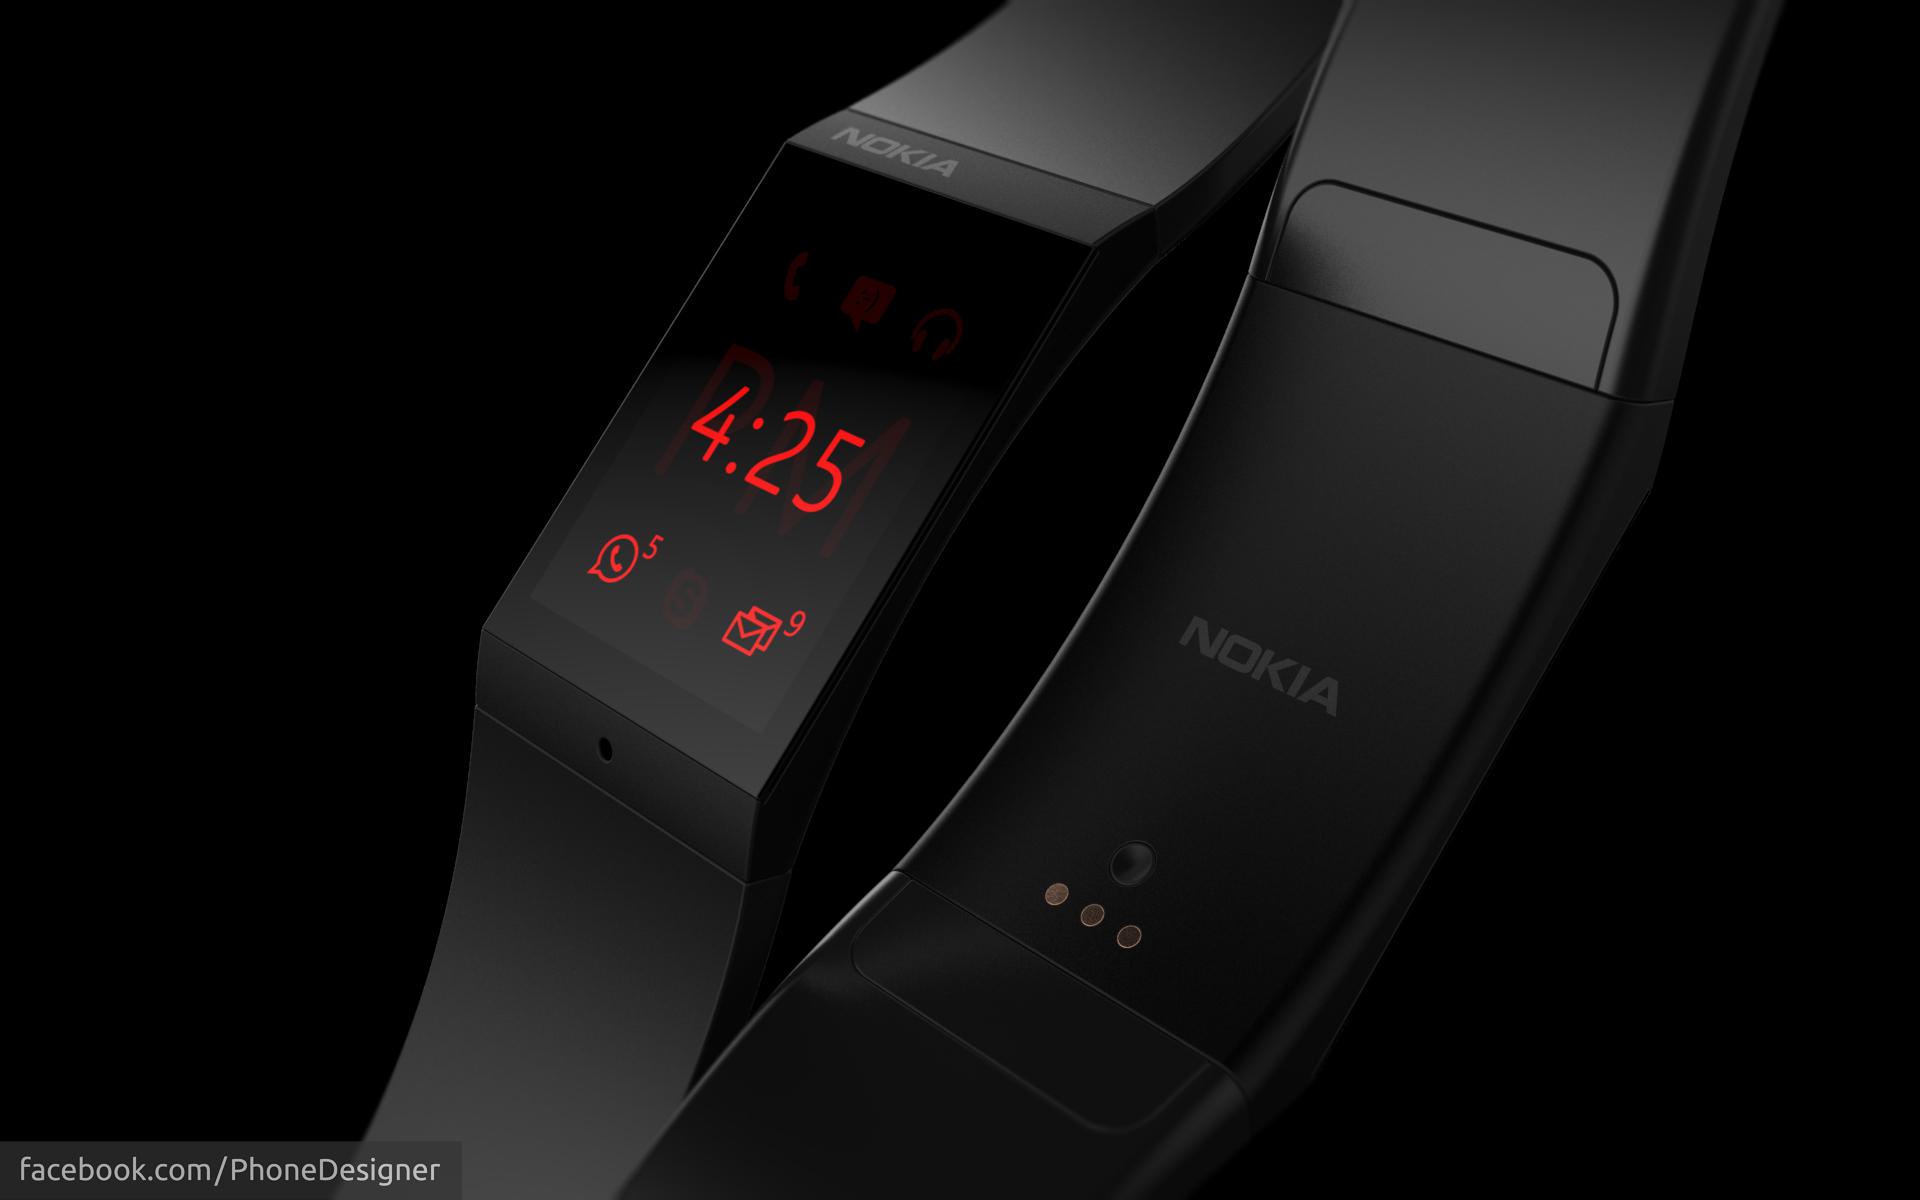 Nokia Smartwatch by Jonas-Daehnert